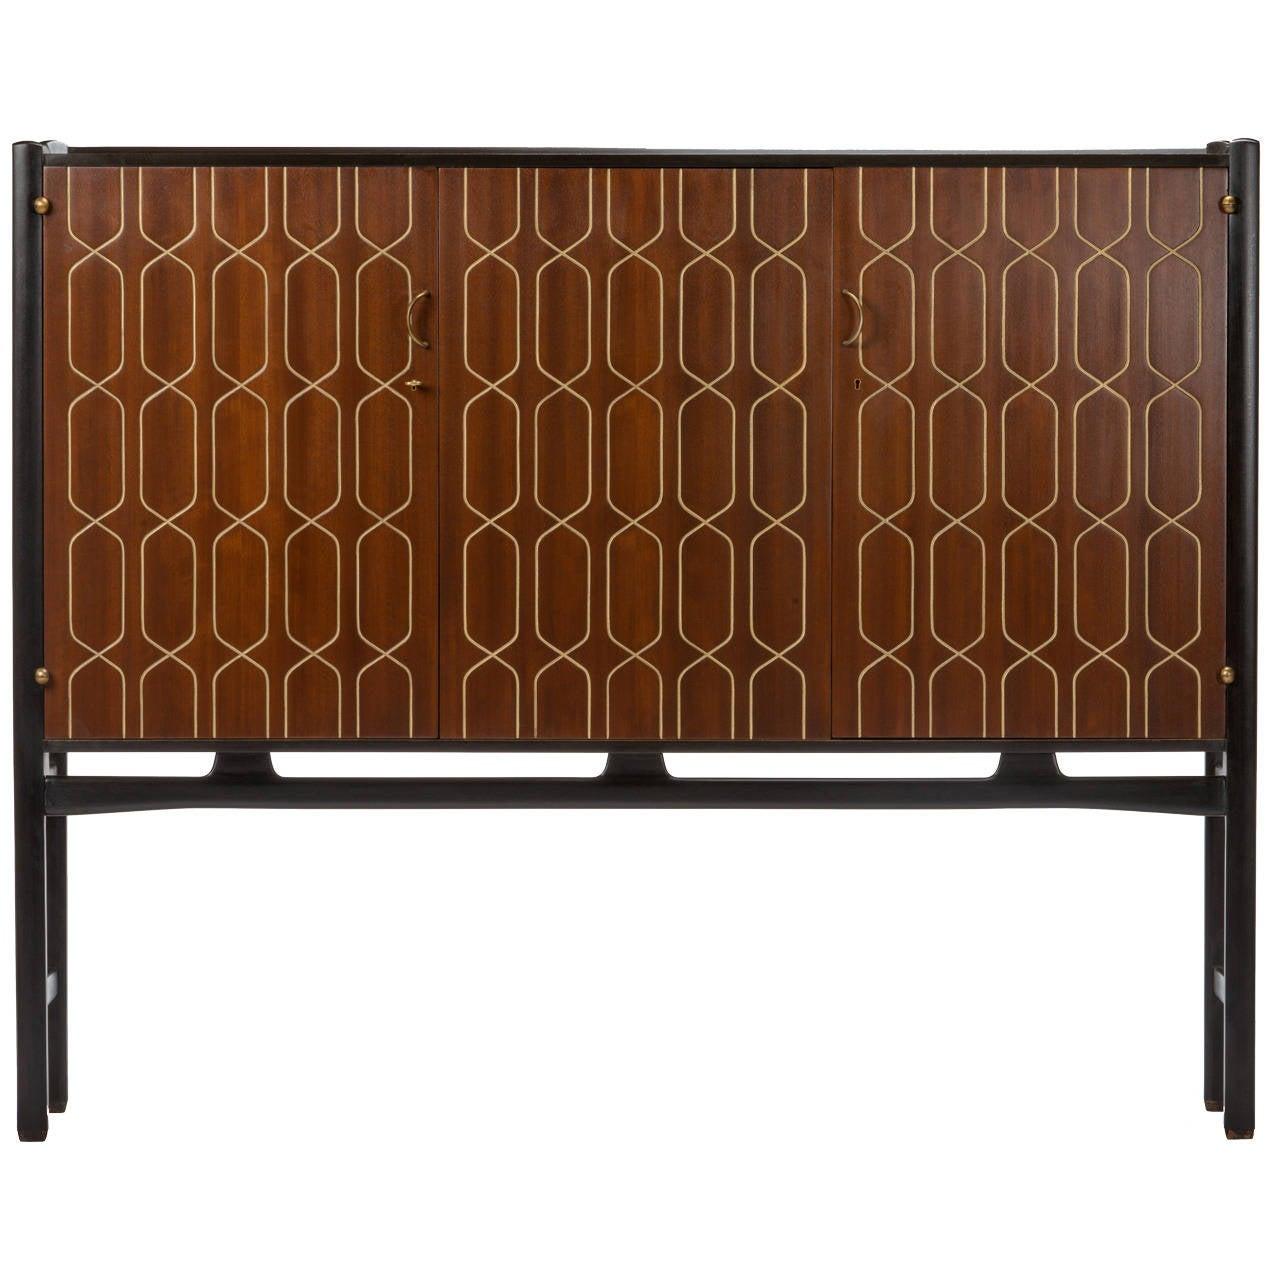 Sideboard by David Rosen for Nordiska Kompaniet For Sale at 1stdibs